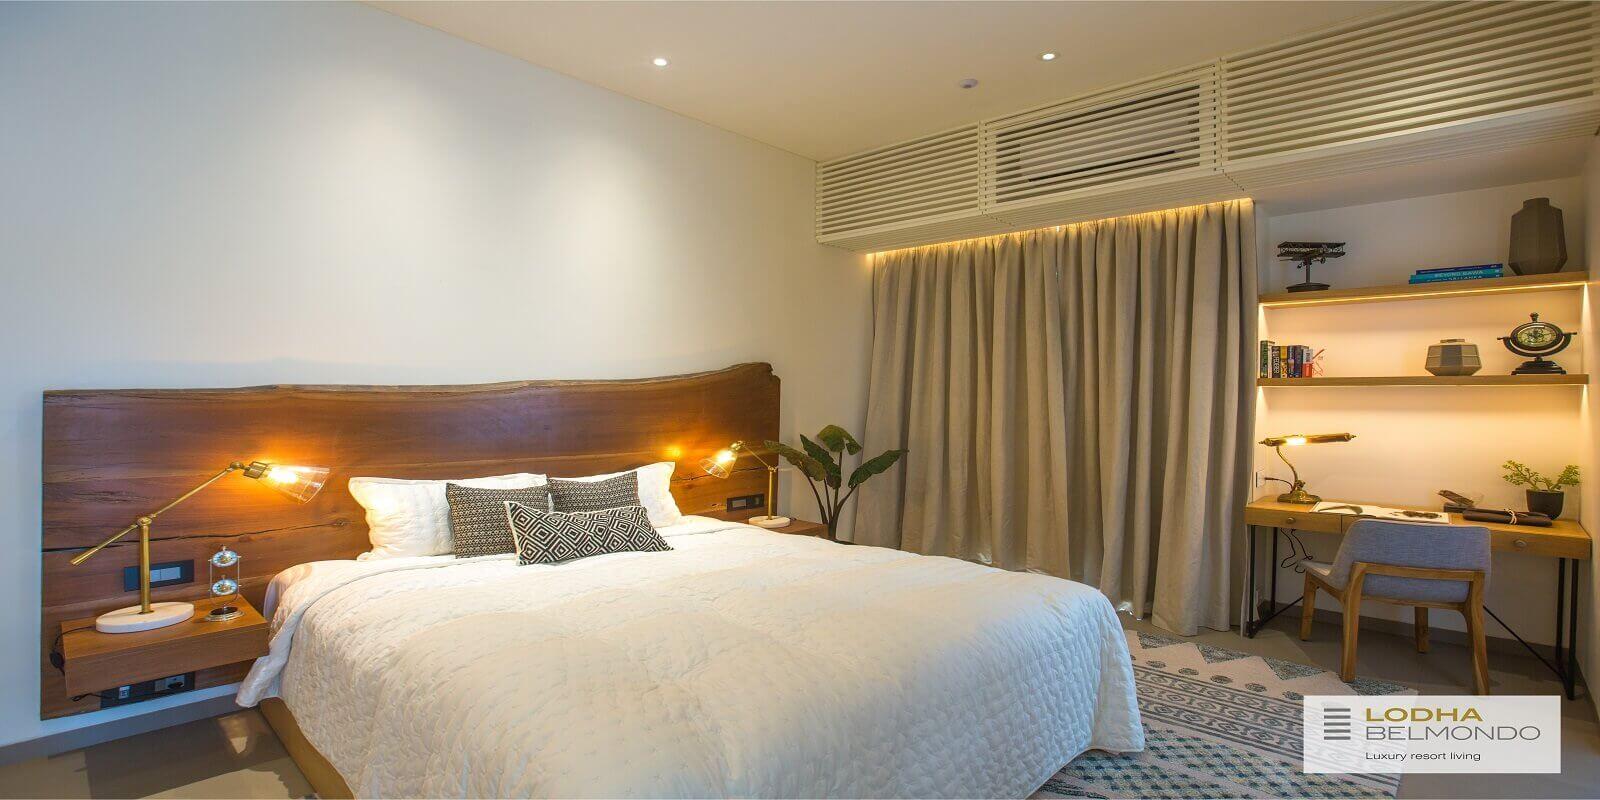 lodha belmondo apartment interiors5